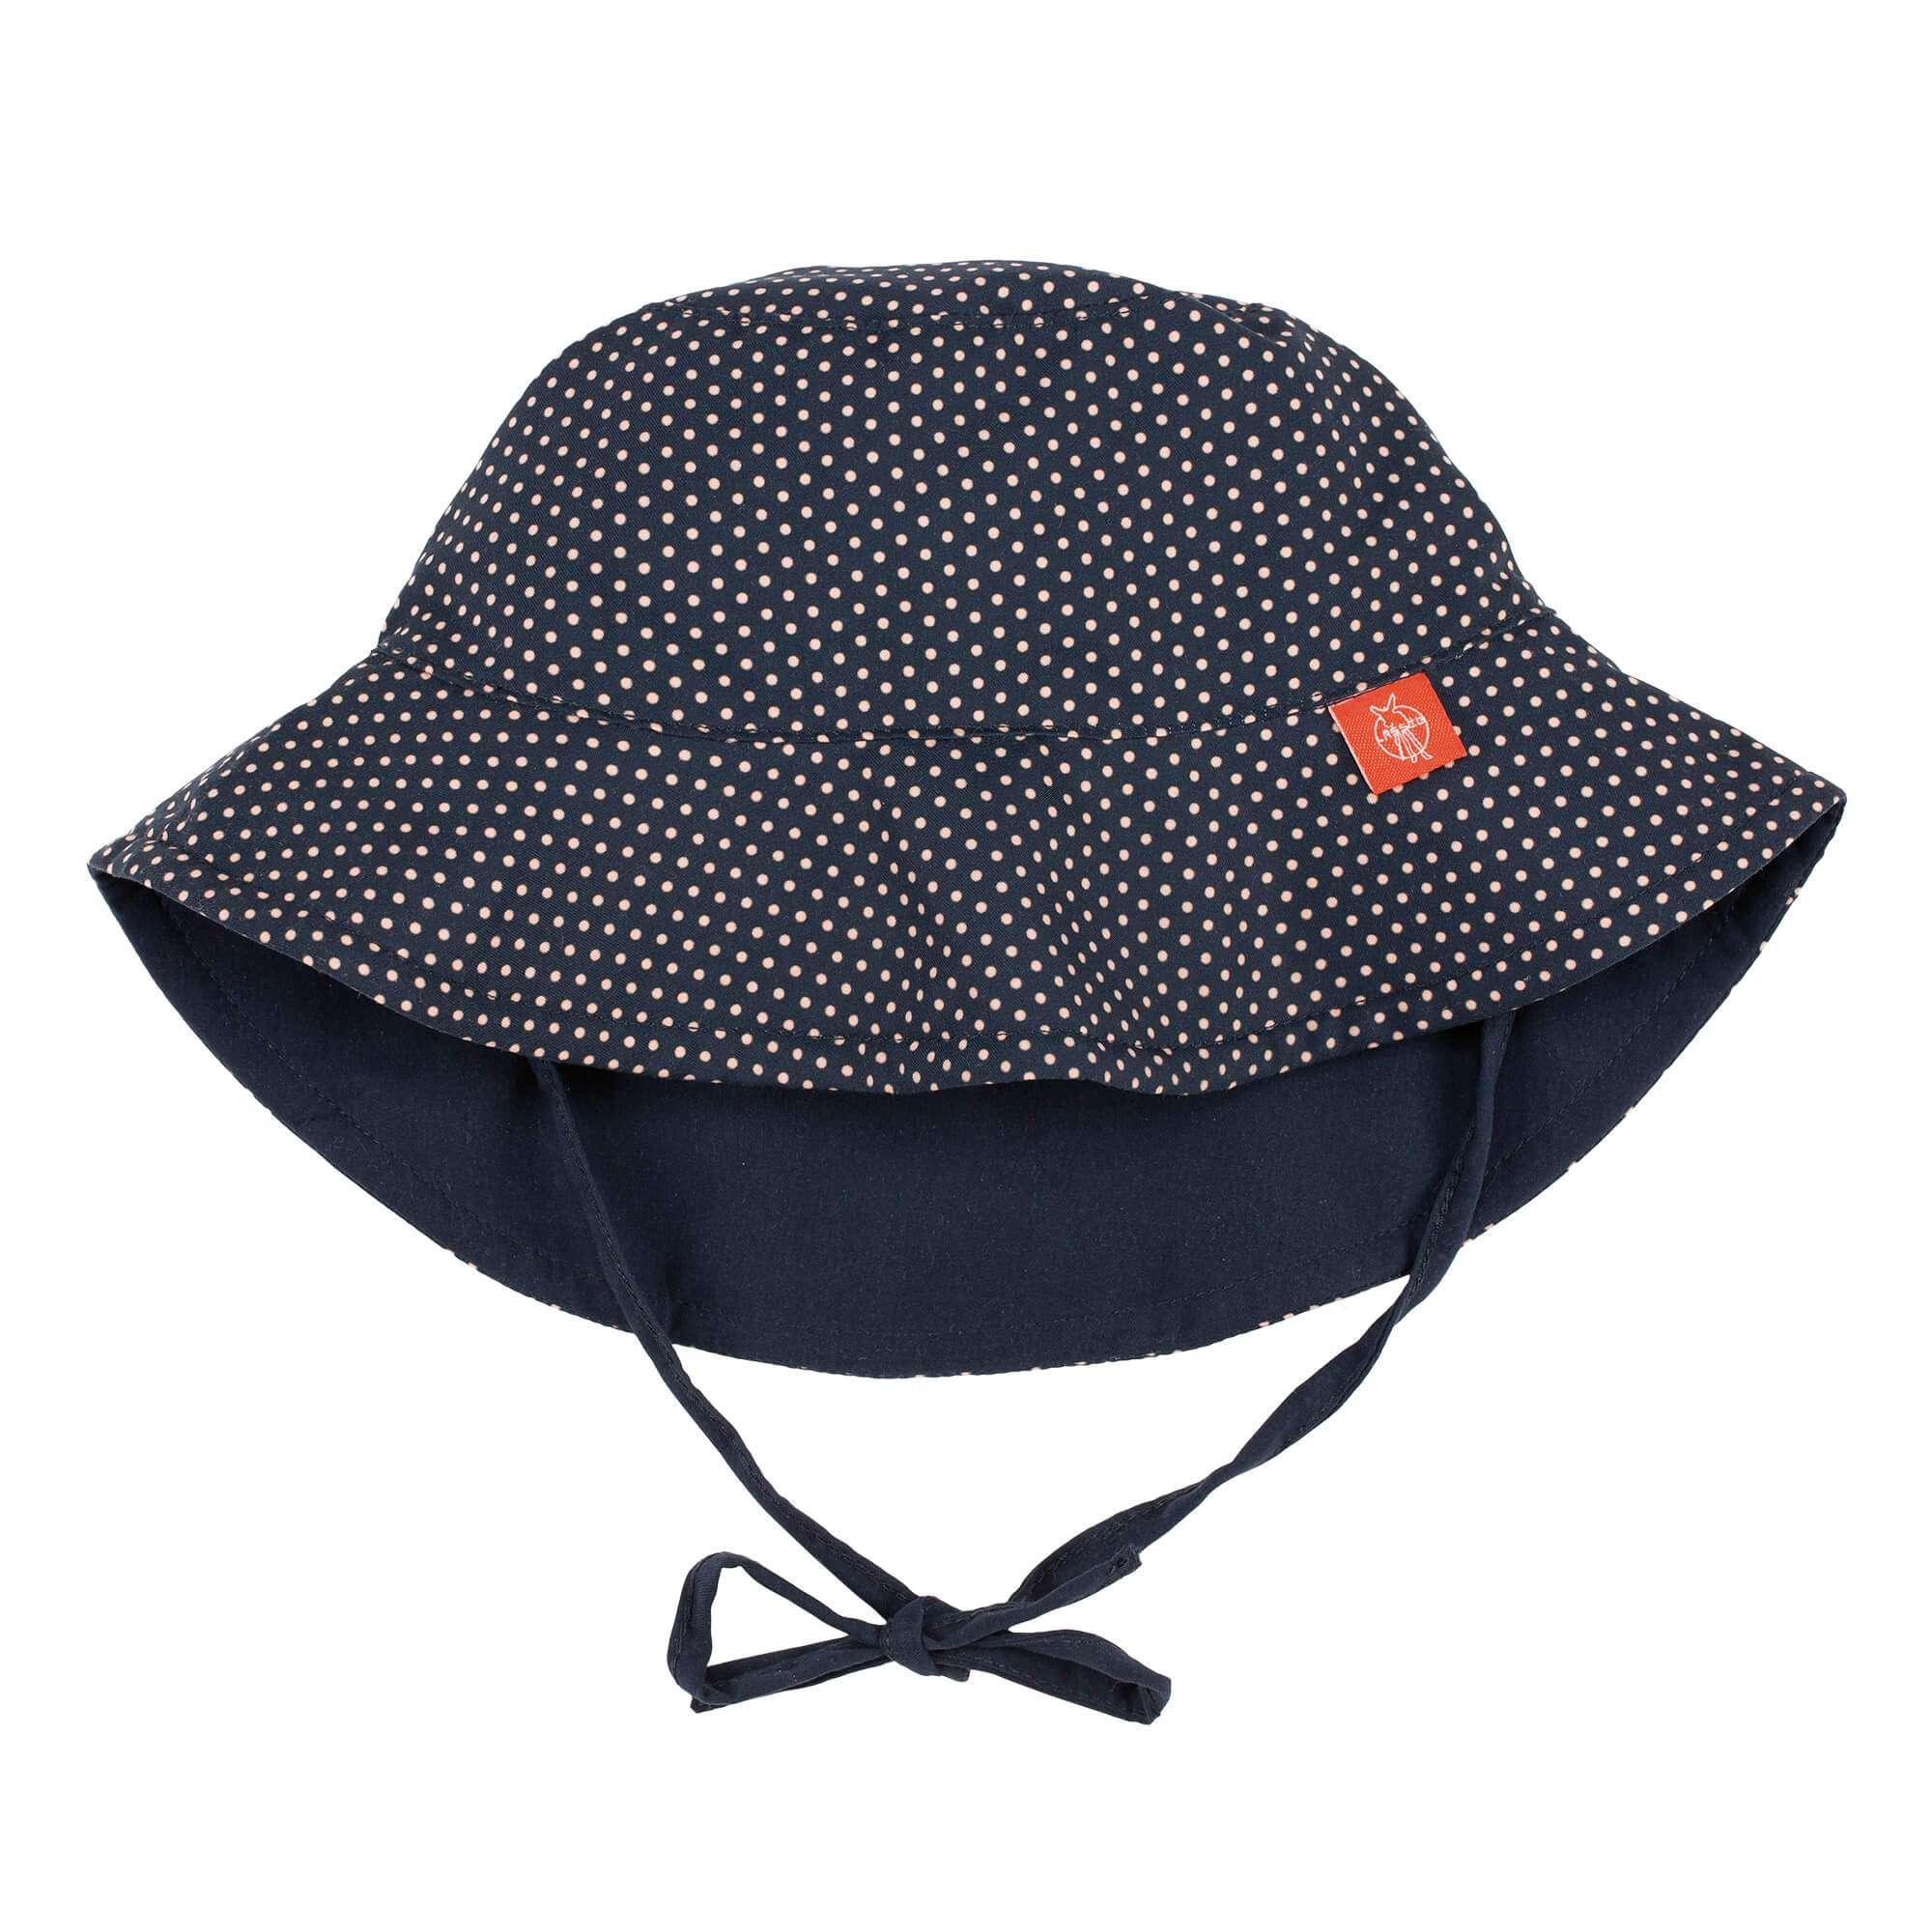 bef3f6f18a5 Lassig Sun Protection Bucket Hat Kids